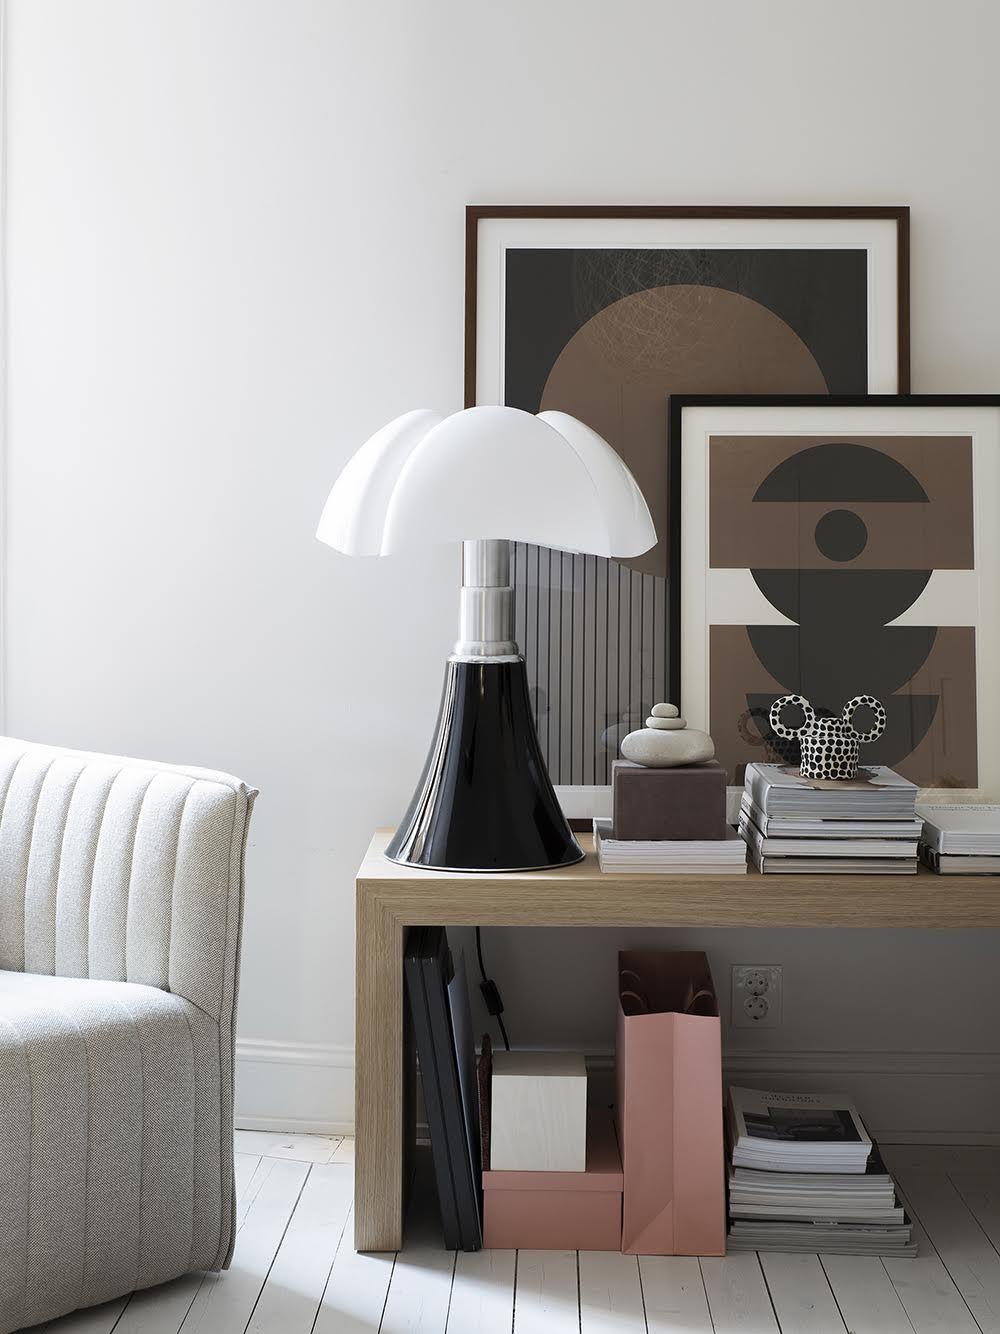 Ampoule Vertigo Petite Friture therese sennerholt design | interior, interior design